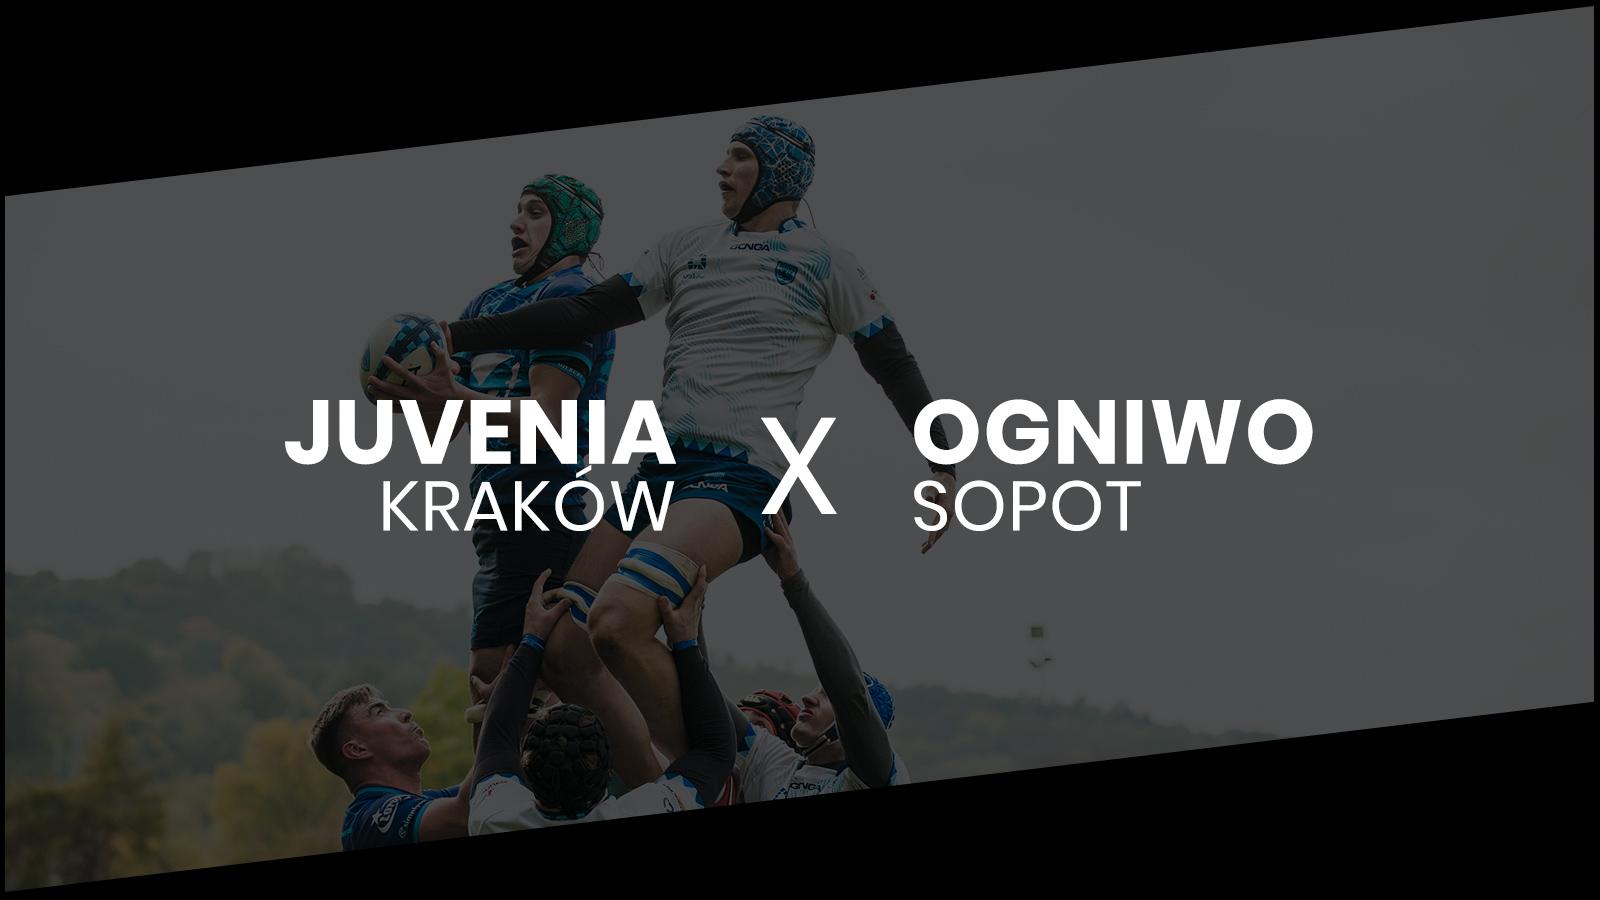 Juvenia Kraków - Ogniwo Sopot Ekstraliga Rugby 2021/22 Foto: Kuba Malicki